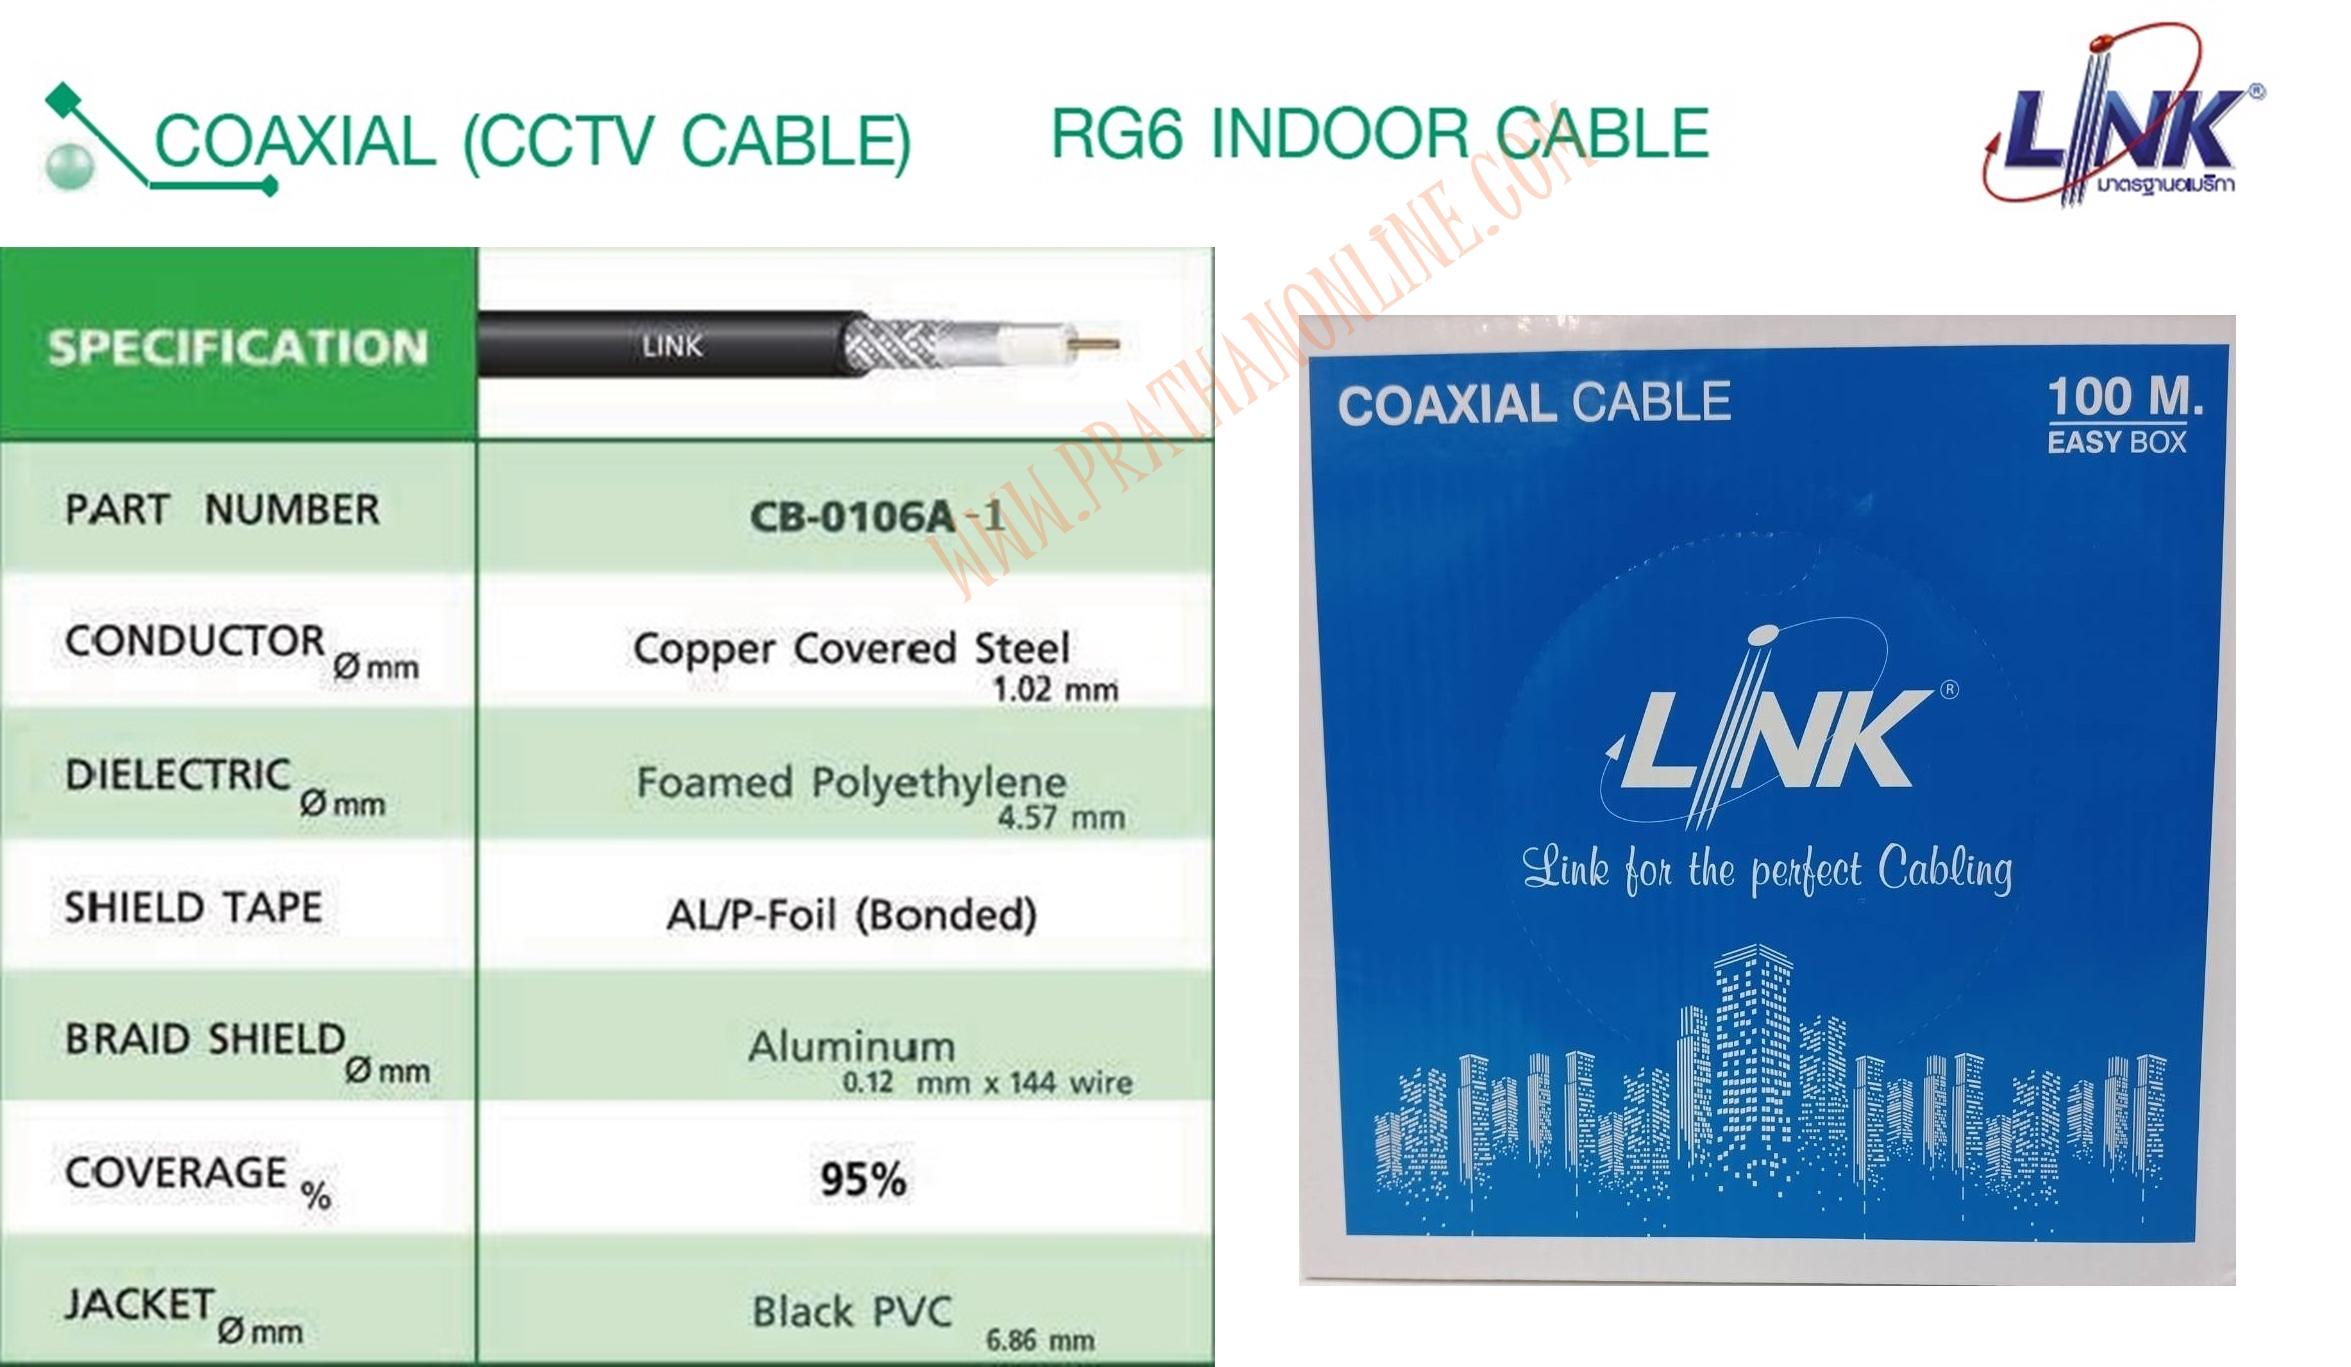 CB-0106A-1 RG6/U สีดำ ชีล95% (กล่อง 100 เมตร) LINK